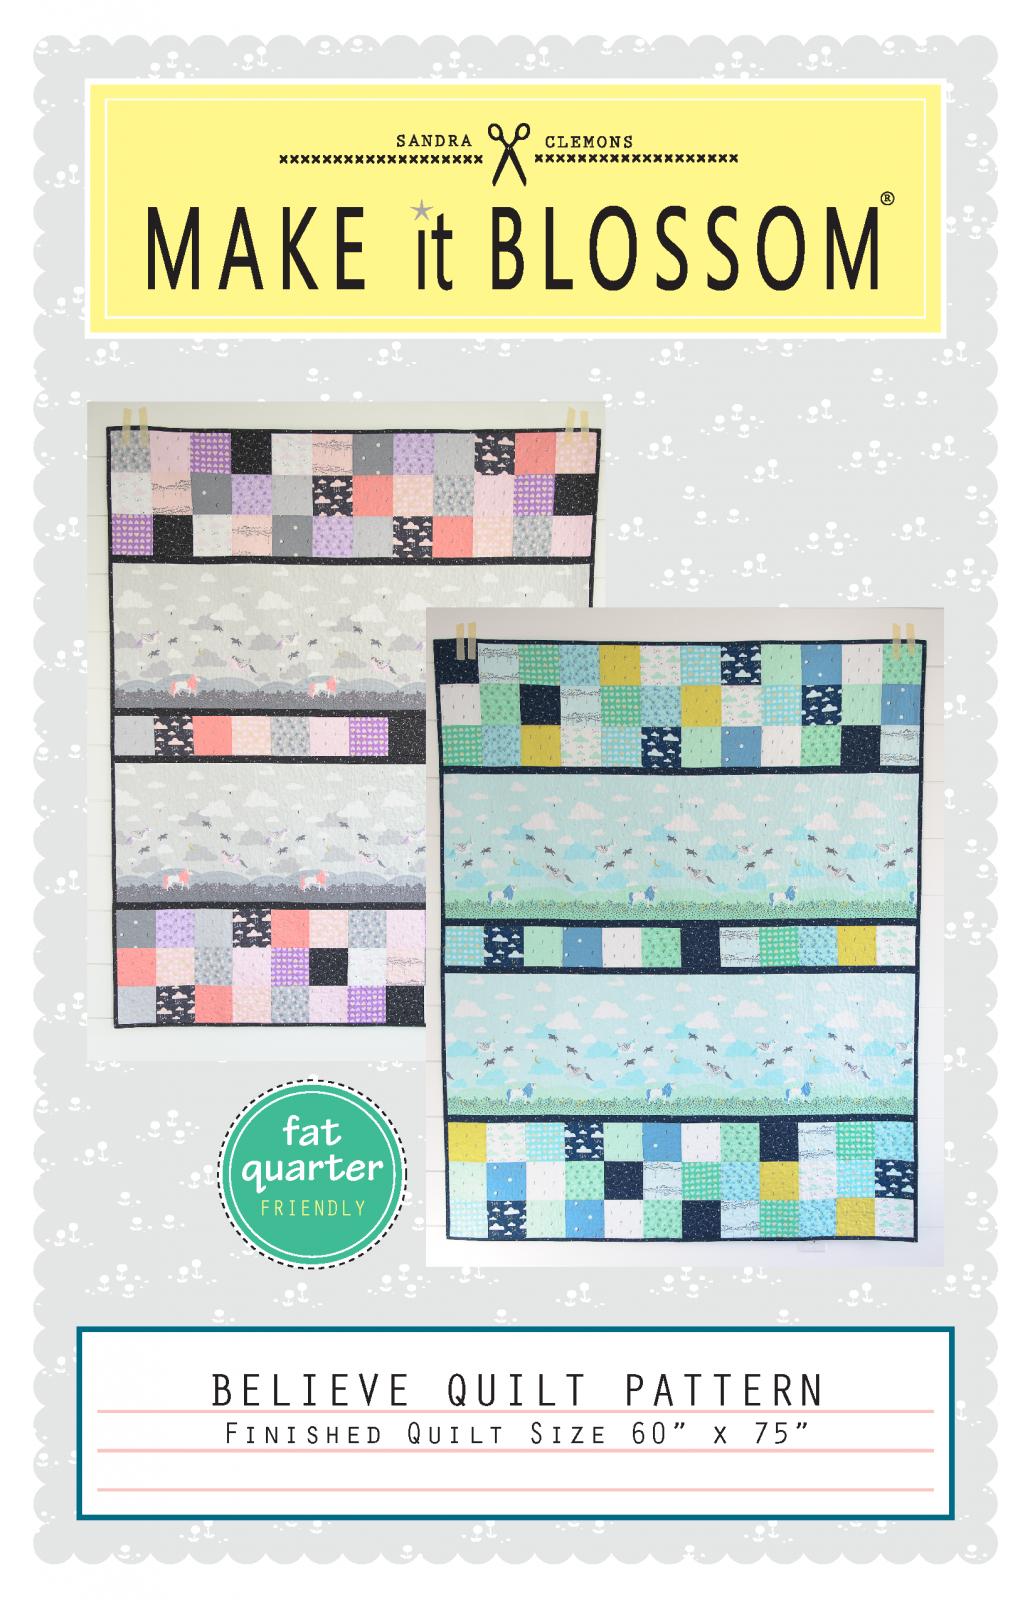 SC158 Believe Quilt Pattern by Sandra Clemons